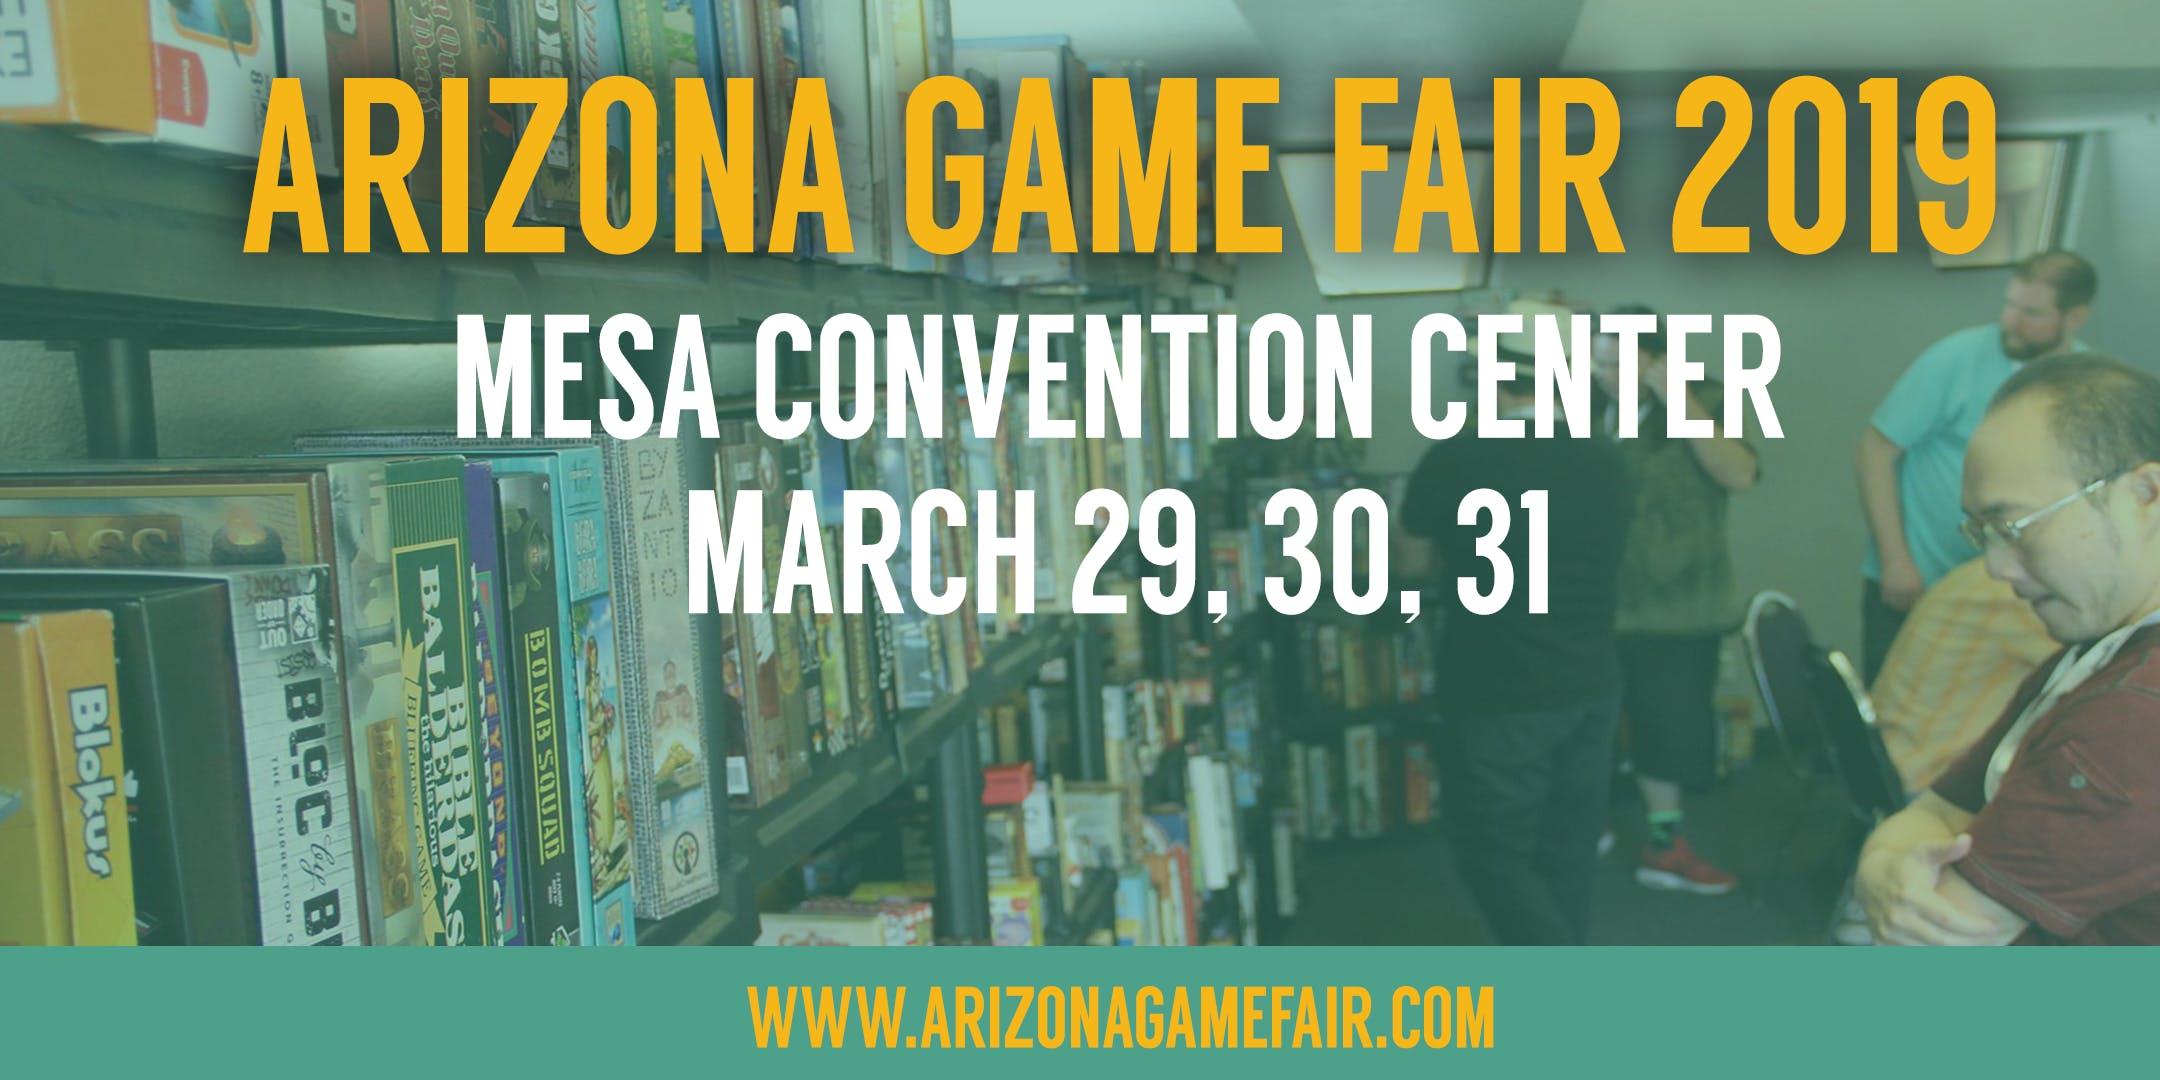 Arizona Game Fair 2019